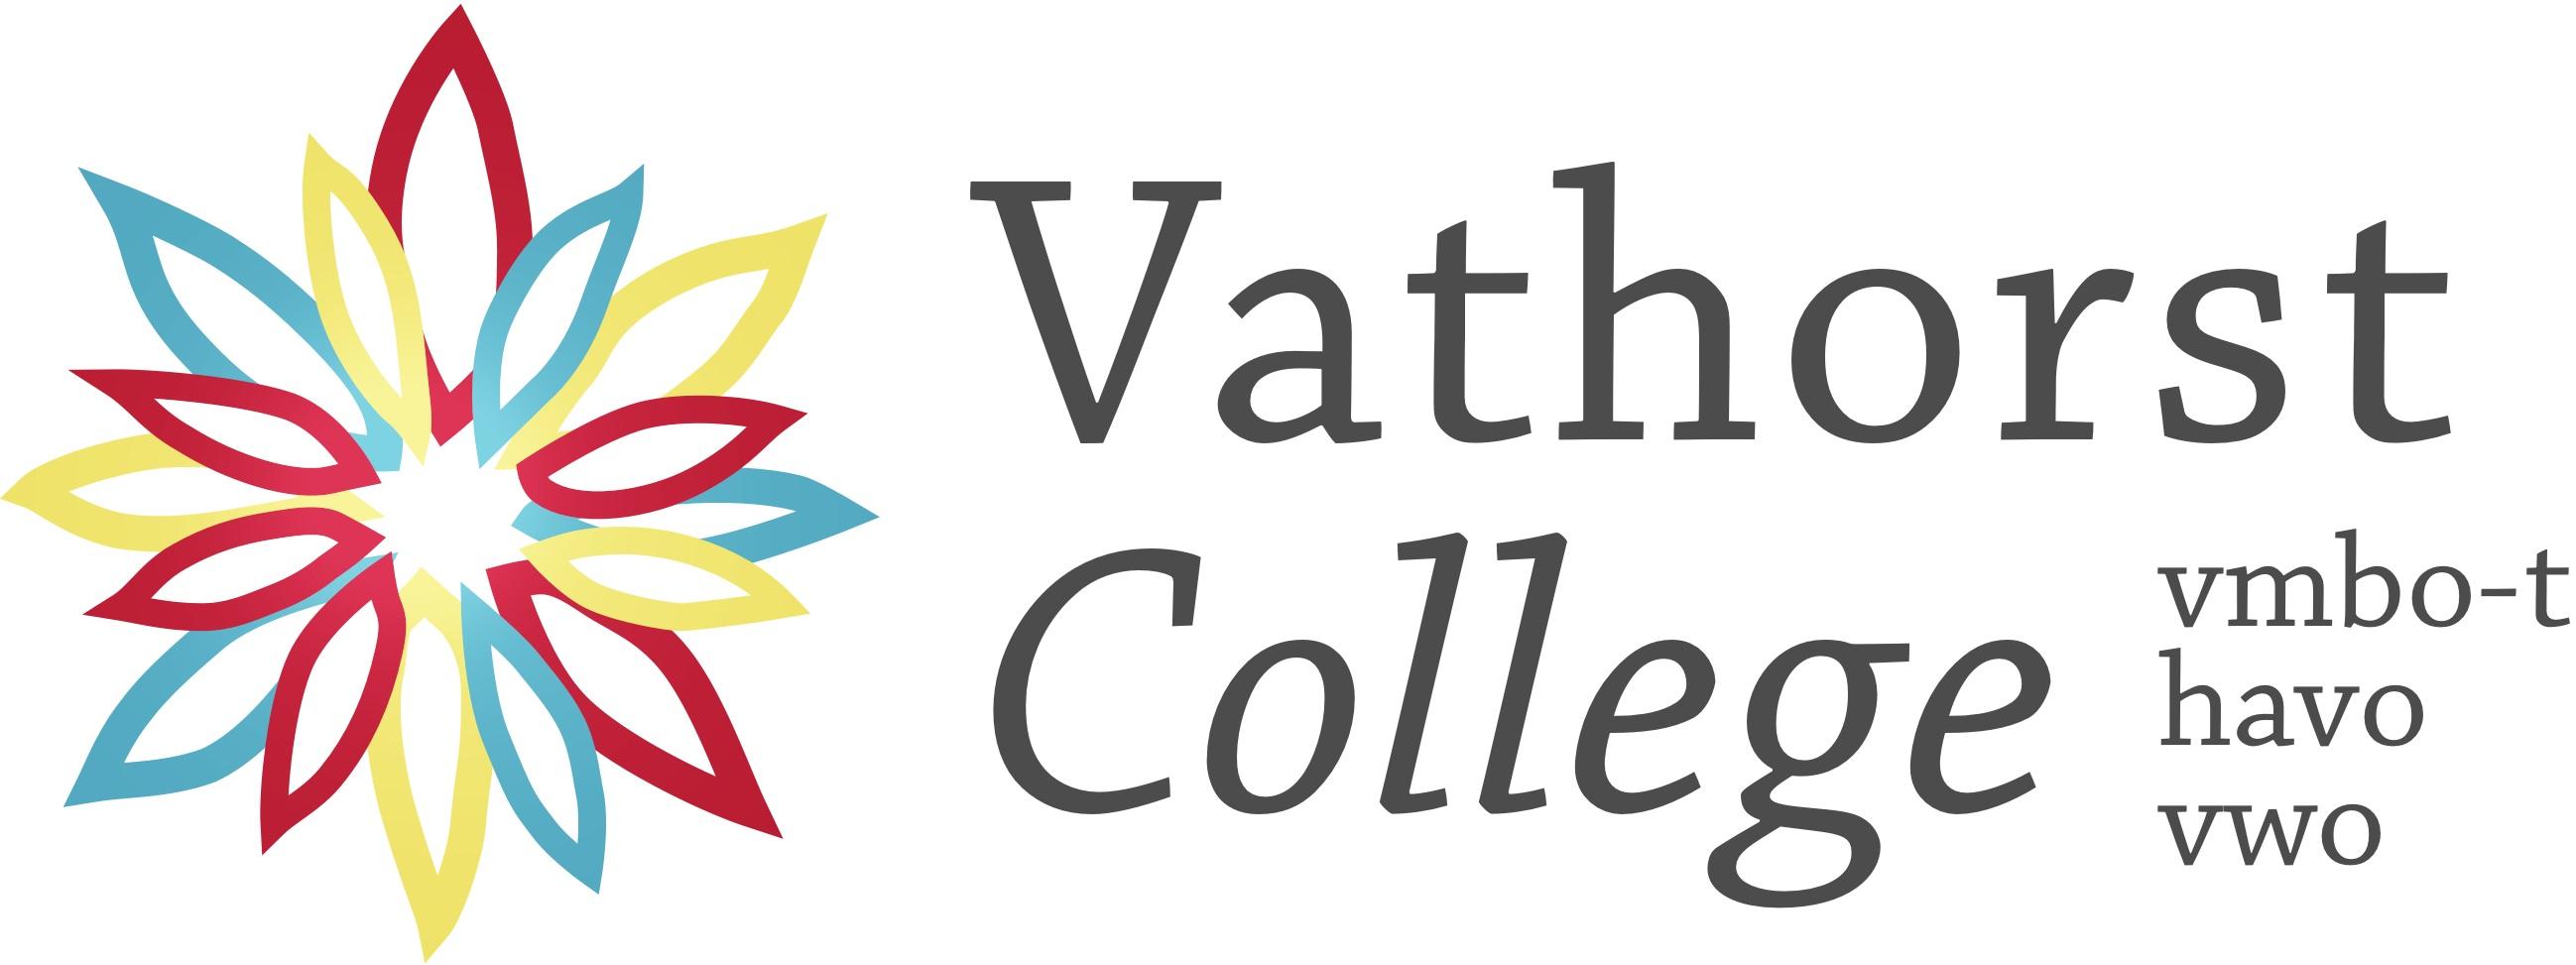 Vathorst College